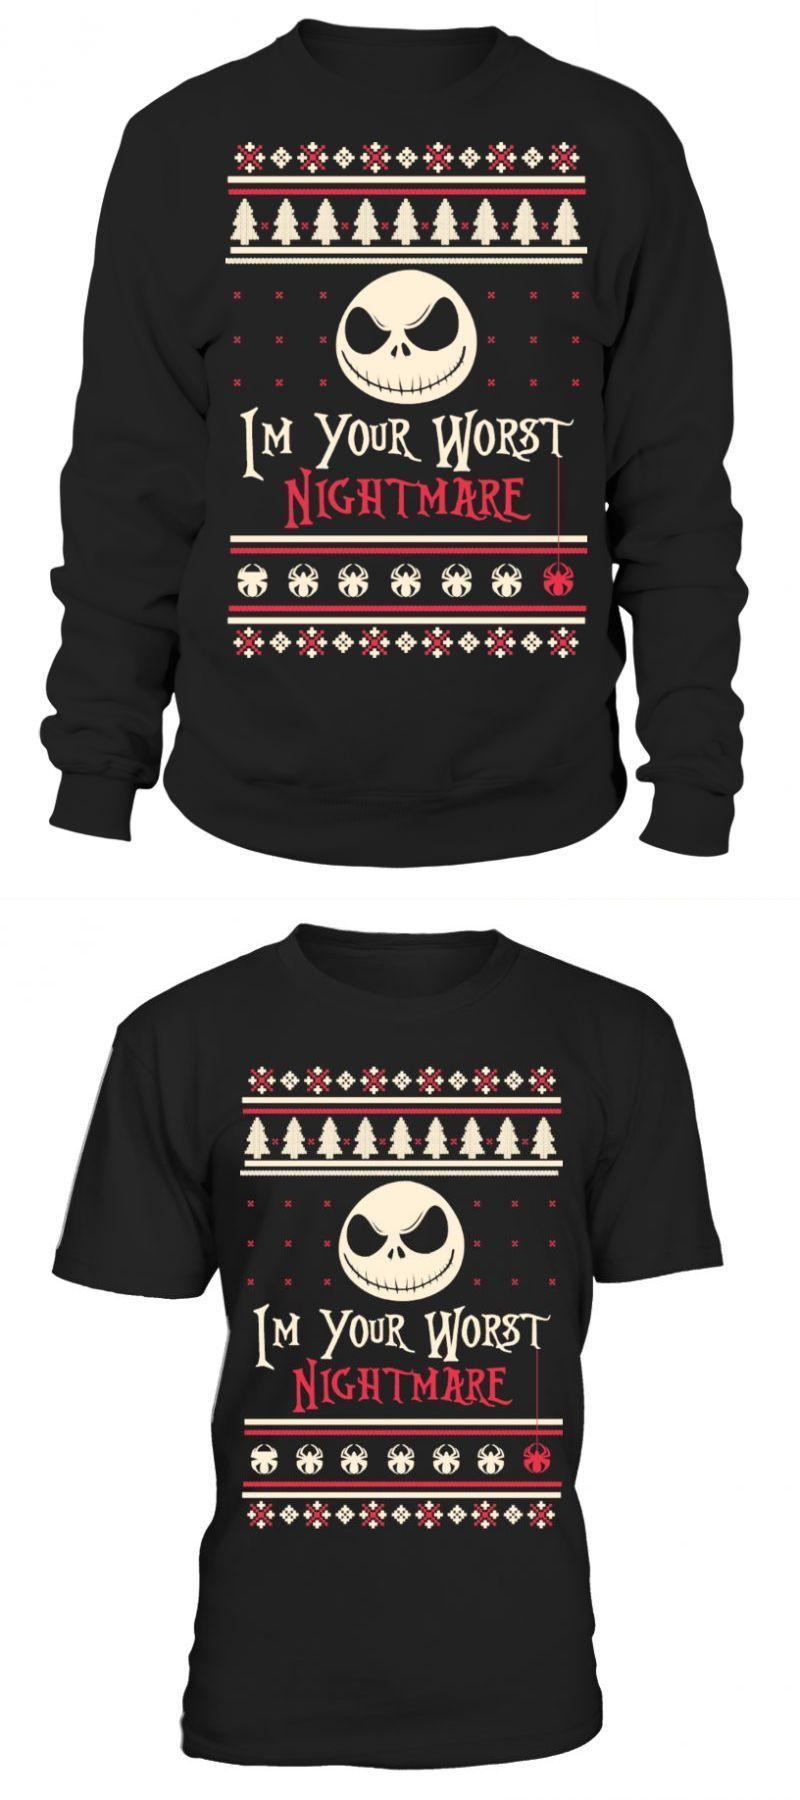 Halloween T Shirt Ideas Diy.Halloween T Shirts I M Your Worst Nightmare Ugly Sweater